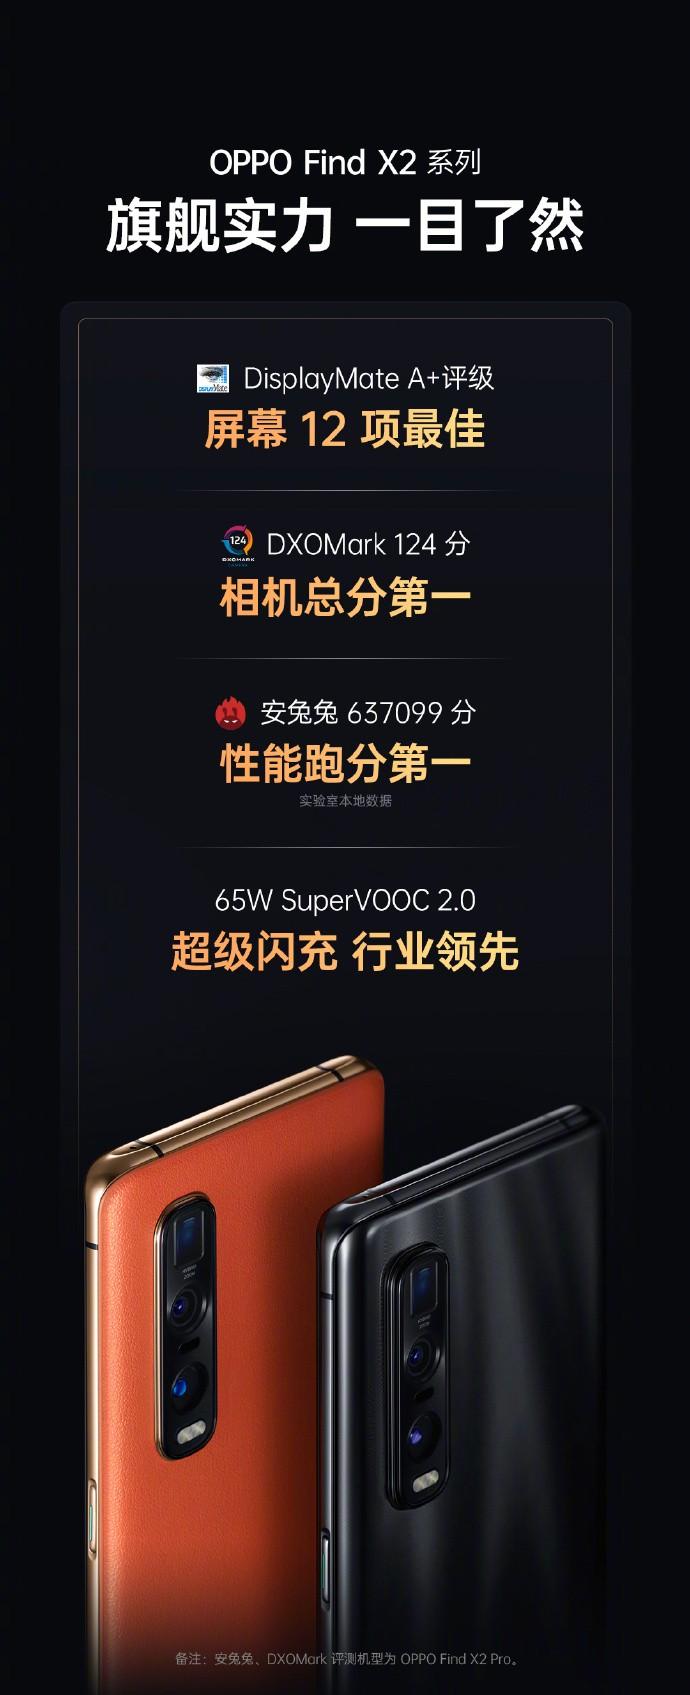 OPPO Find X2 Pro AnTuTu, DisplayMate e DxOMark